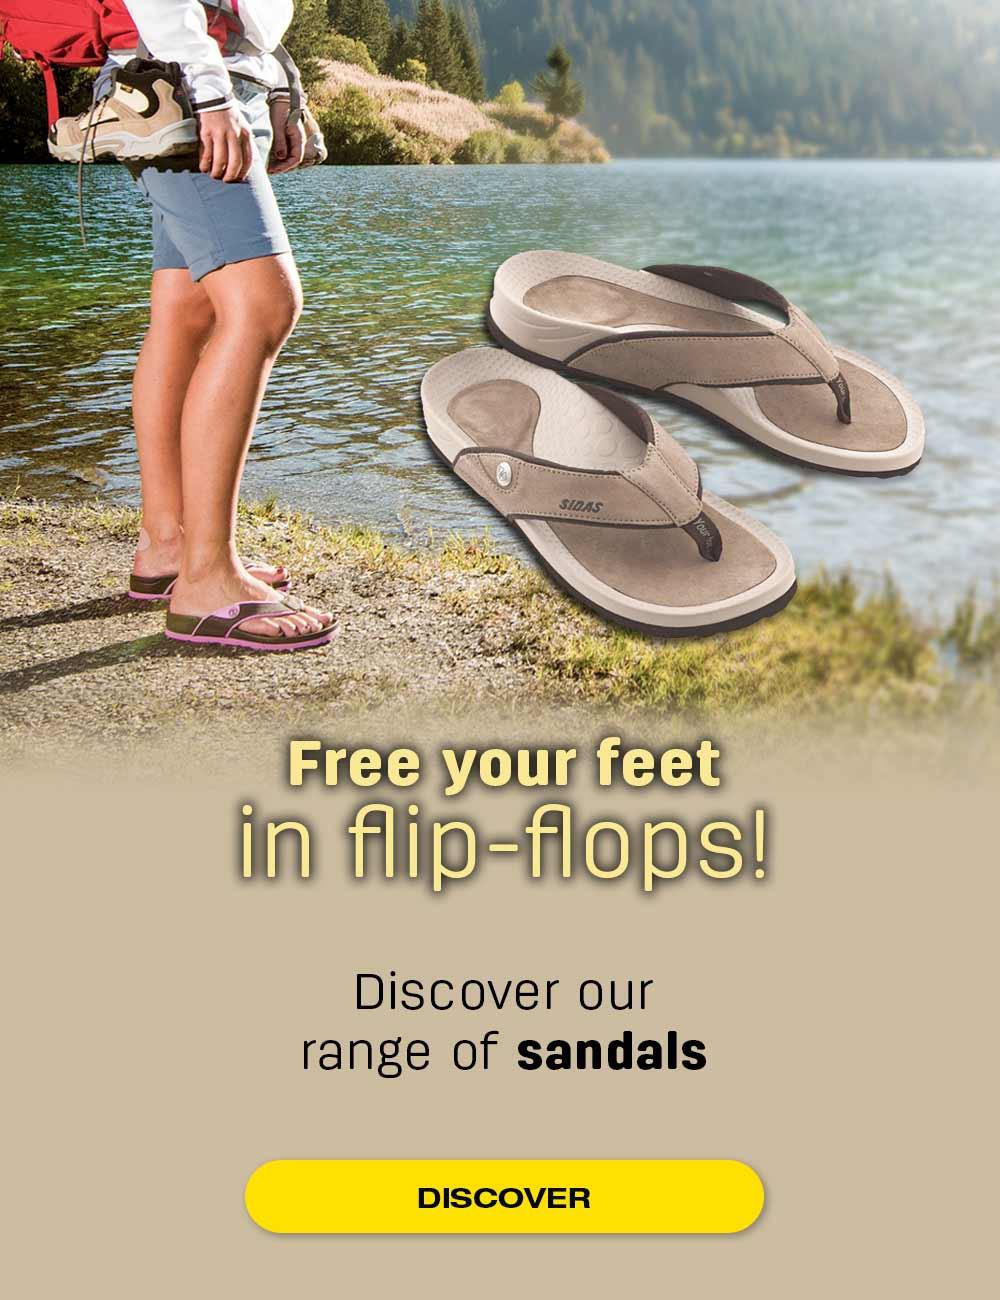 Free your feet in flip-flops!